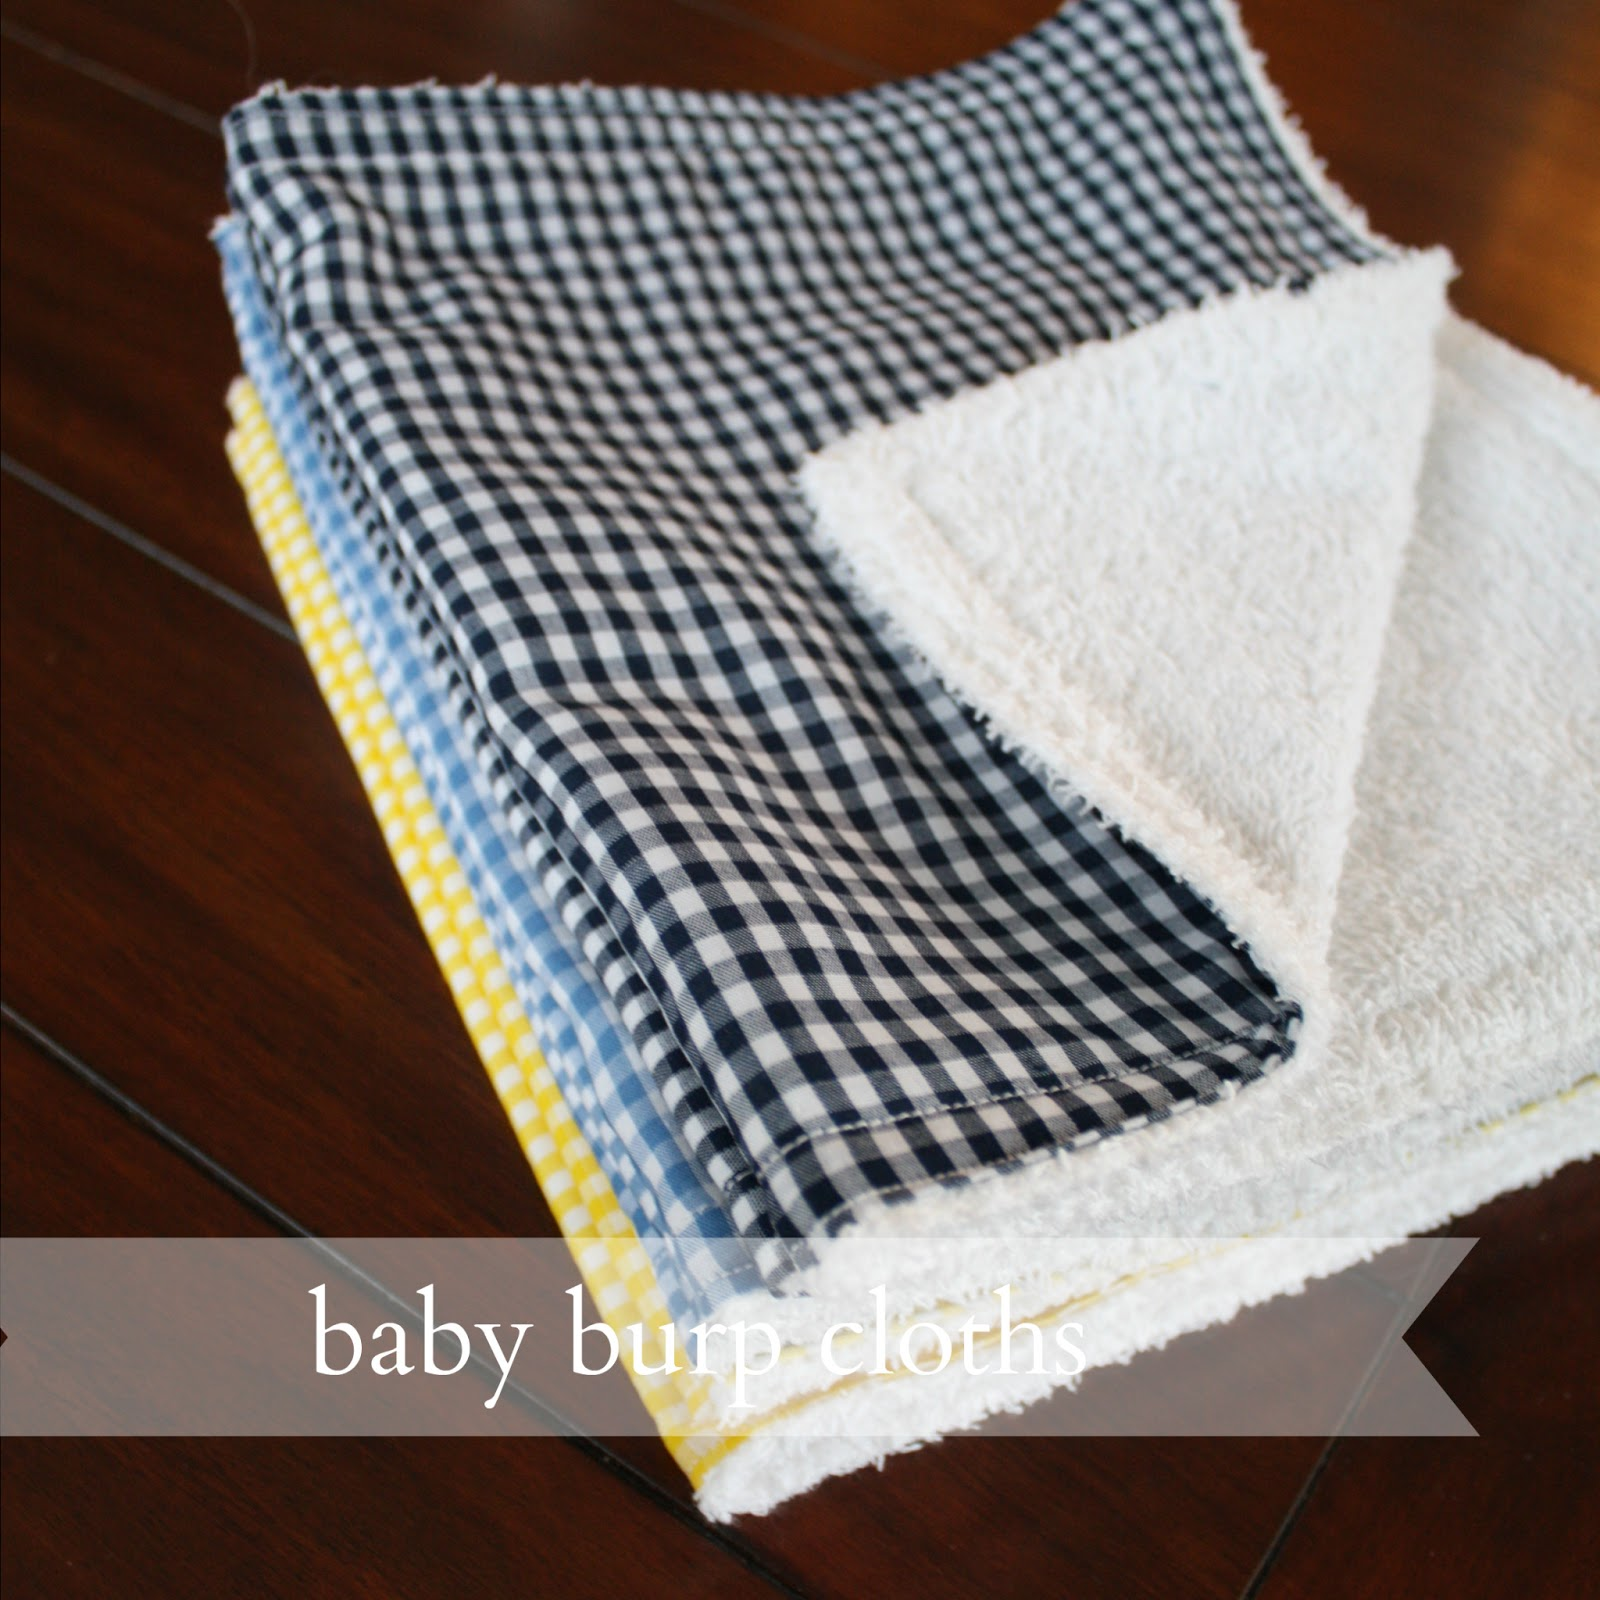 live a little wilder baby burp cloths tutorial